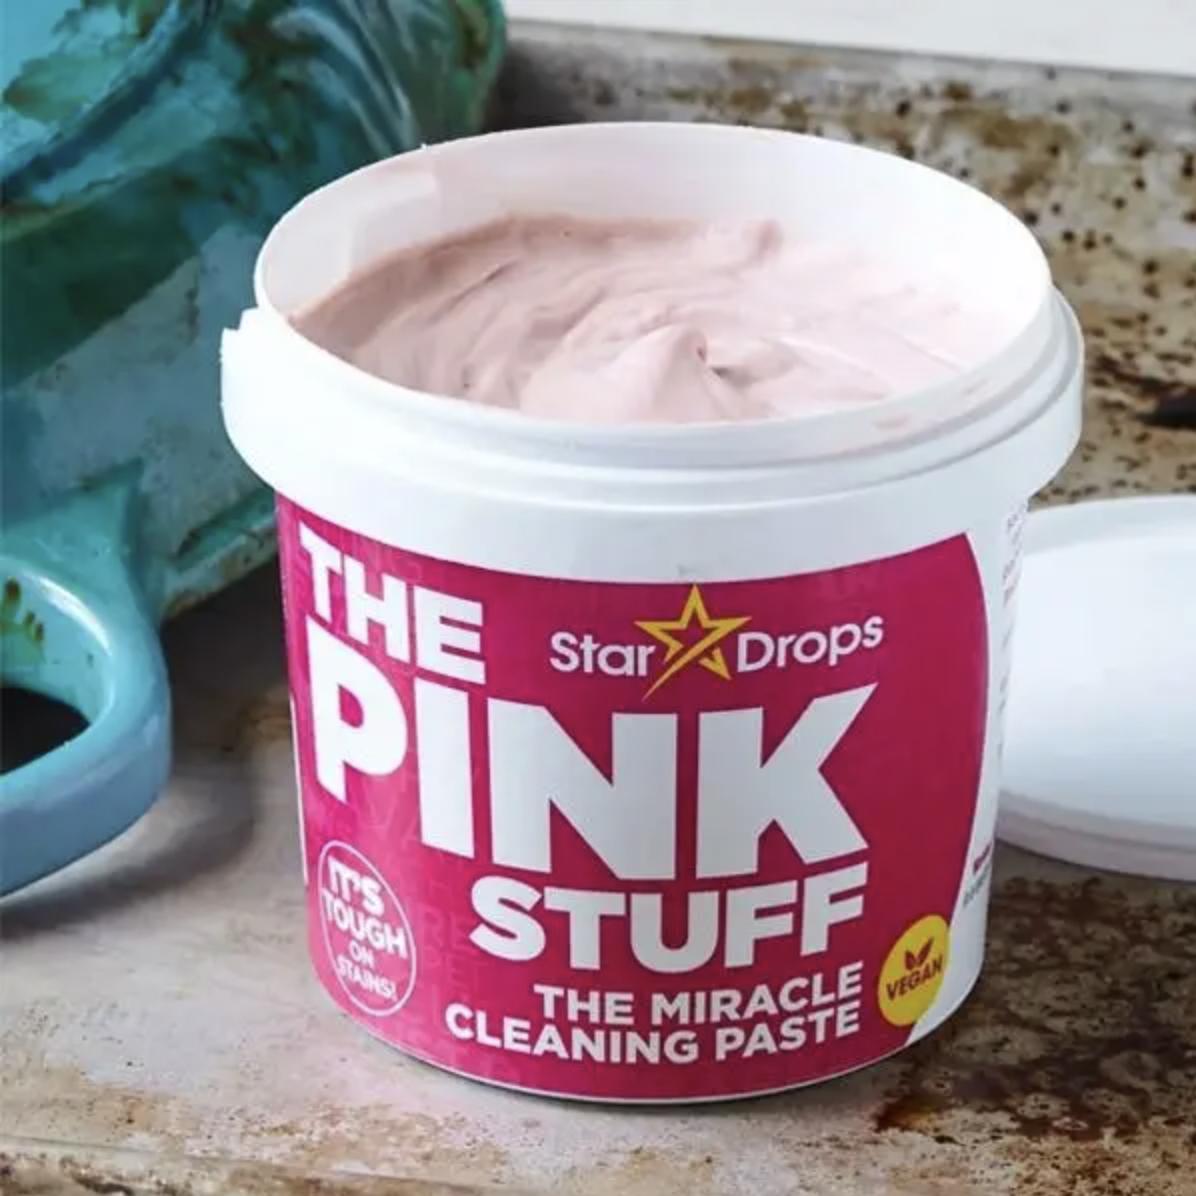 pasta de limpieza multiusos The Pink Stuff